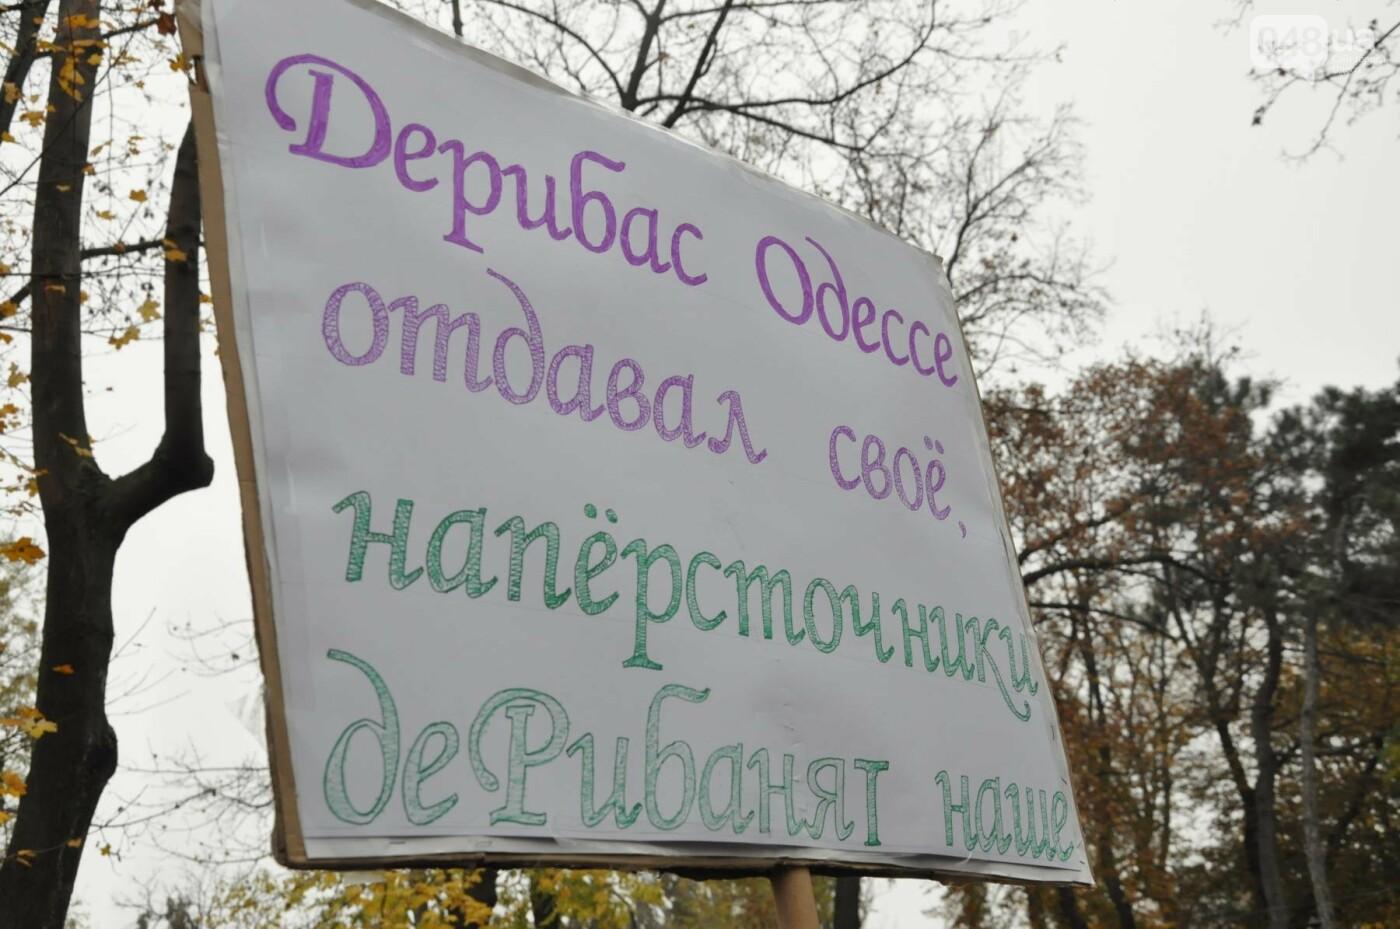 Около 5 сотен одесситов протестовали против застройки Горсада (ФОТО) , фото-2